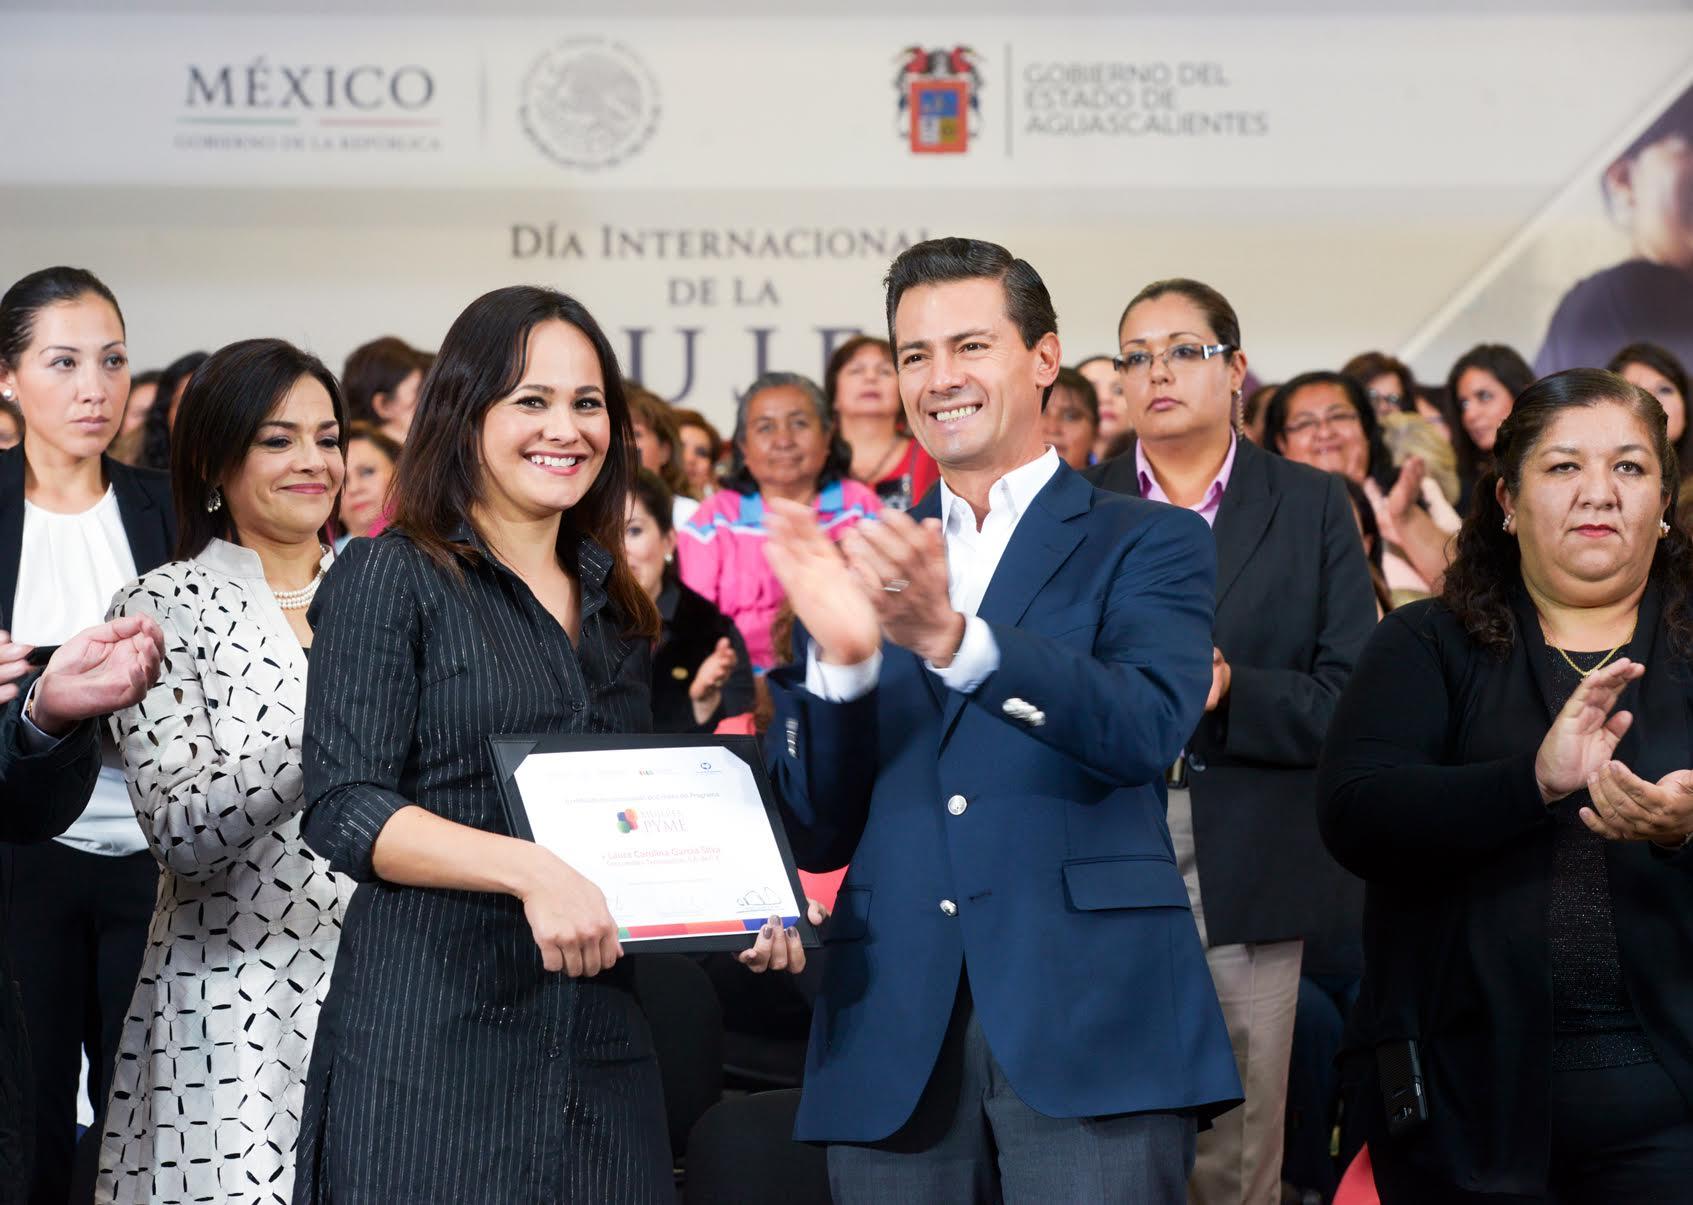 The president  led the celebration of International Women's Day